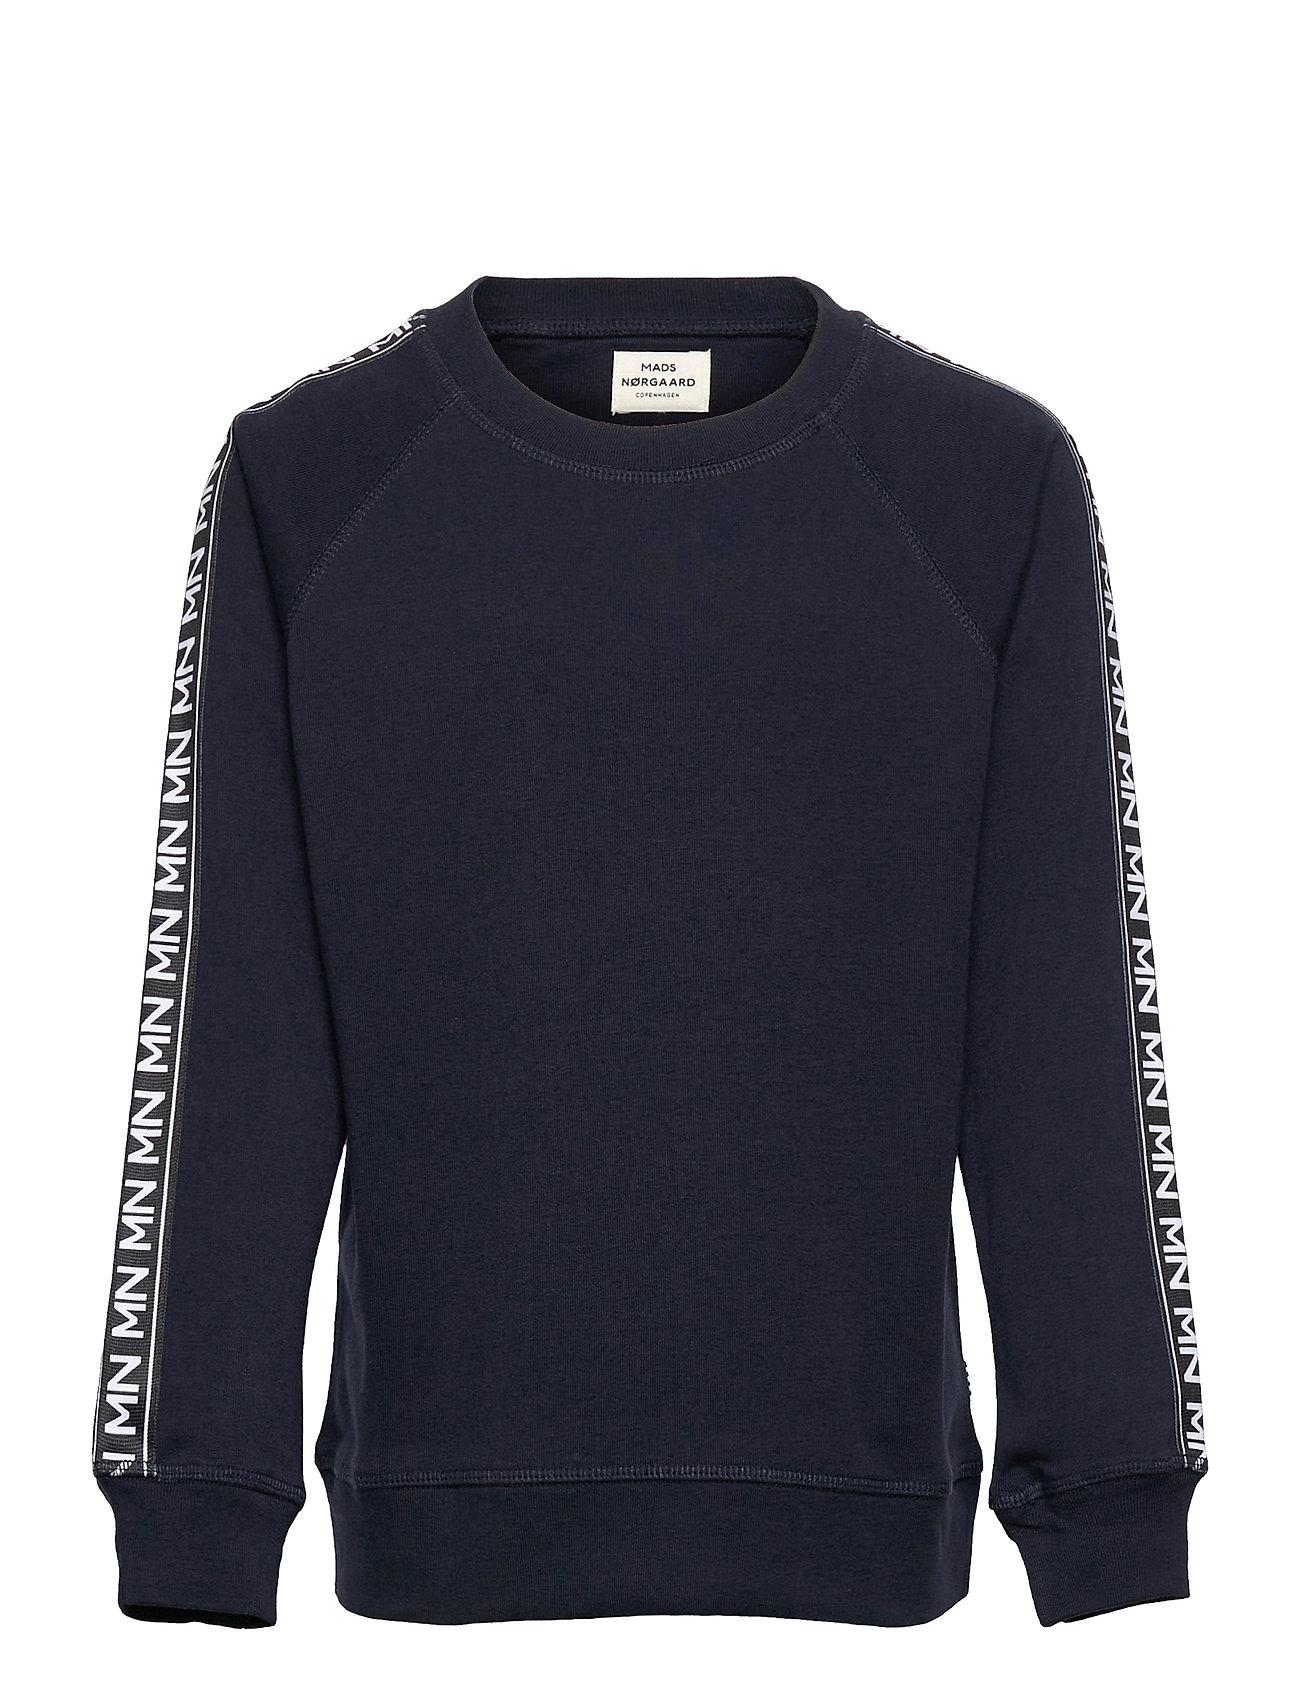 Cotton Rib Steltino Tape Sweatshirt Trøje Blå Mads Nørgaard